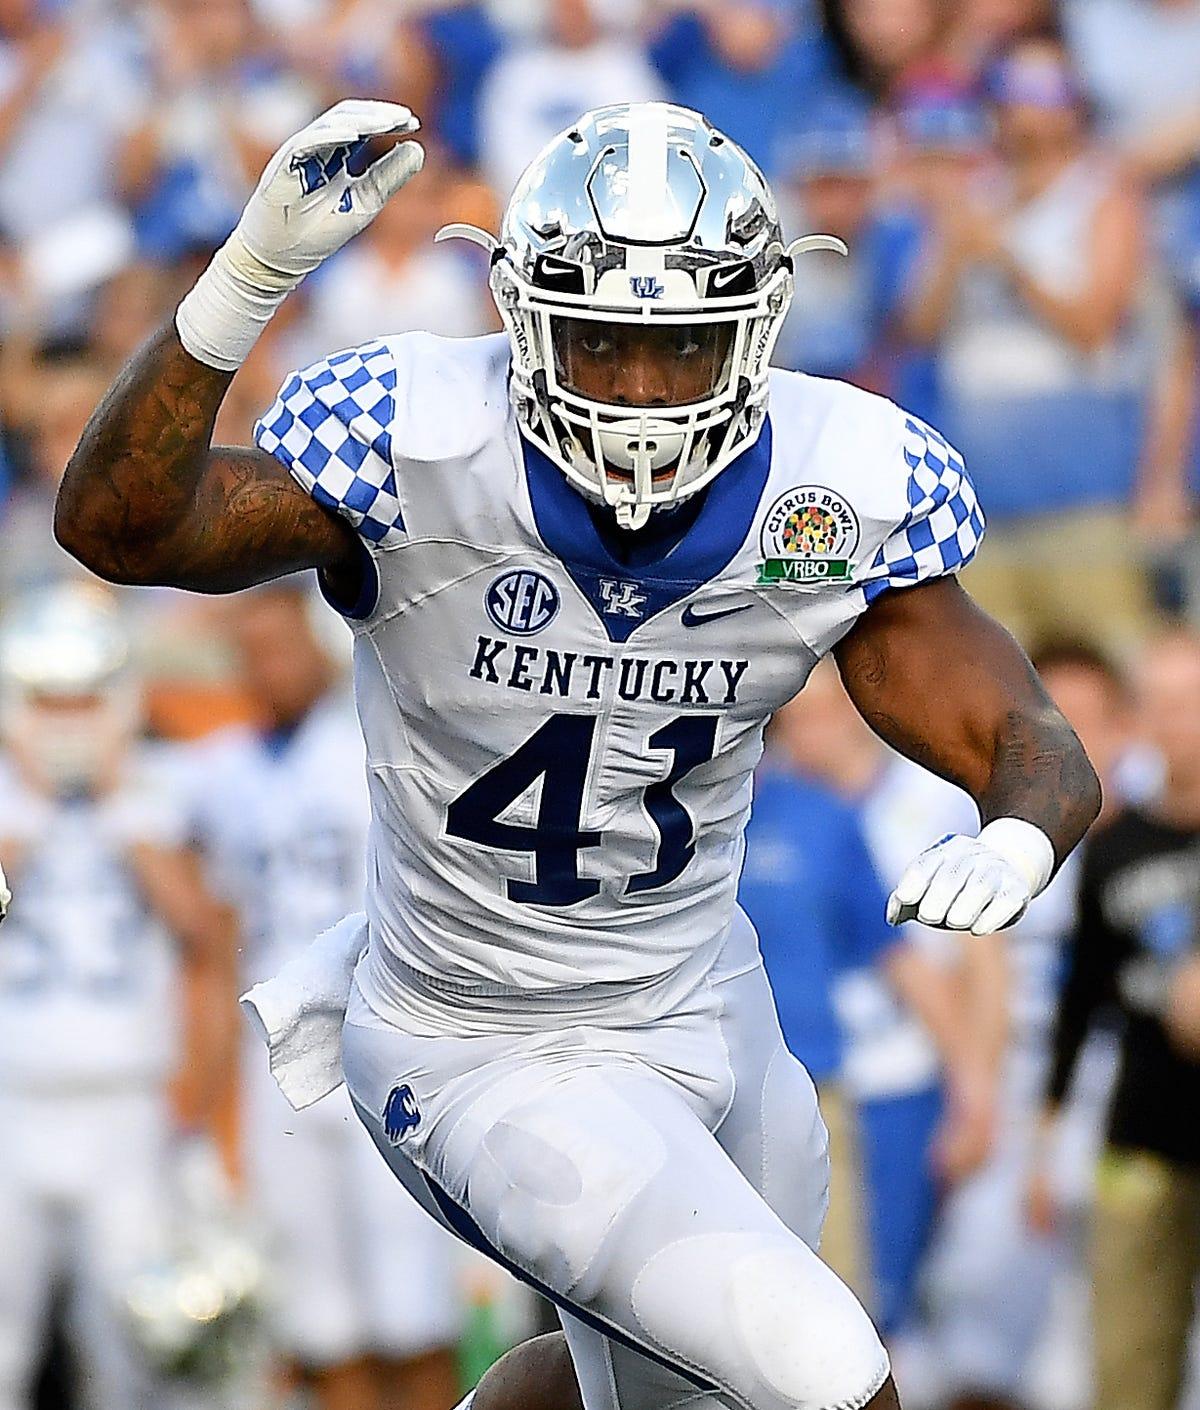 Takeaways from Kentucky football's Citrus Bowl win